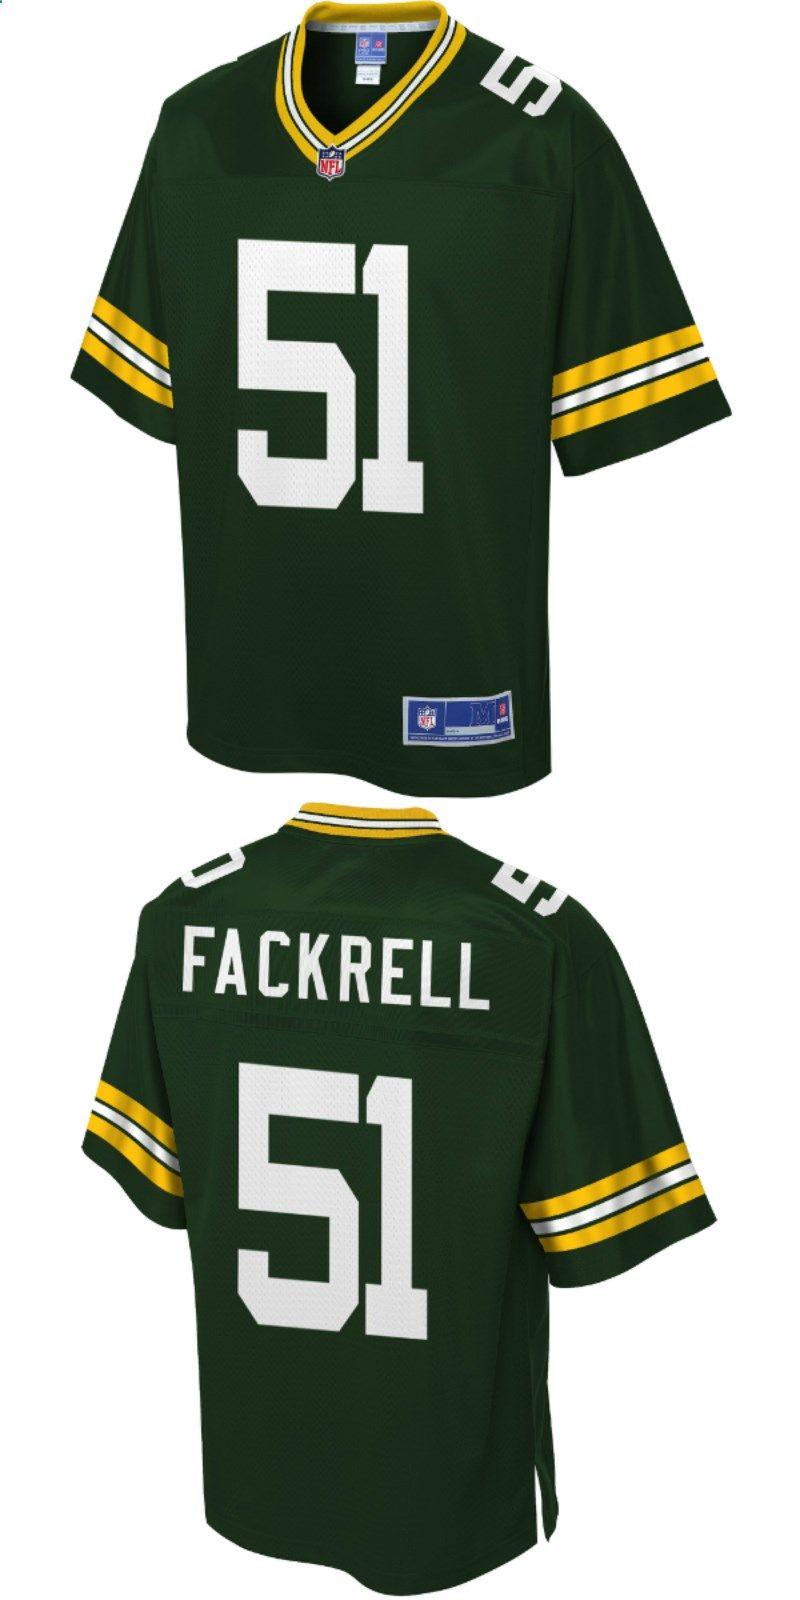 Kyler Fackrell Green Bay Packers Nfl Pro Line Player Jersey Green Nfl Packers Nfl Outfits Packers Football